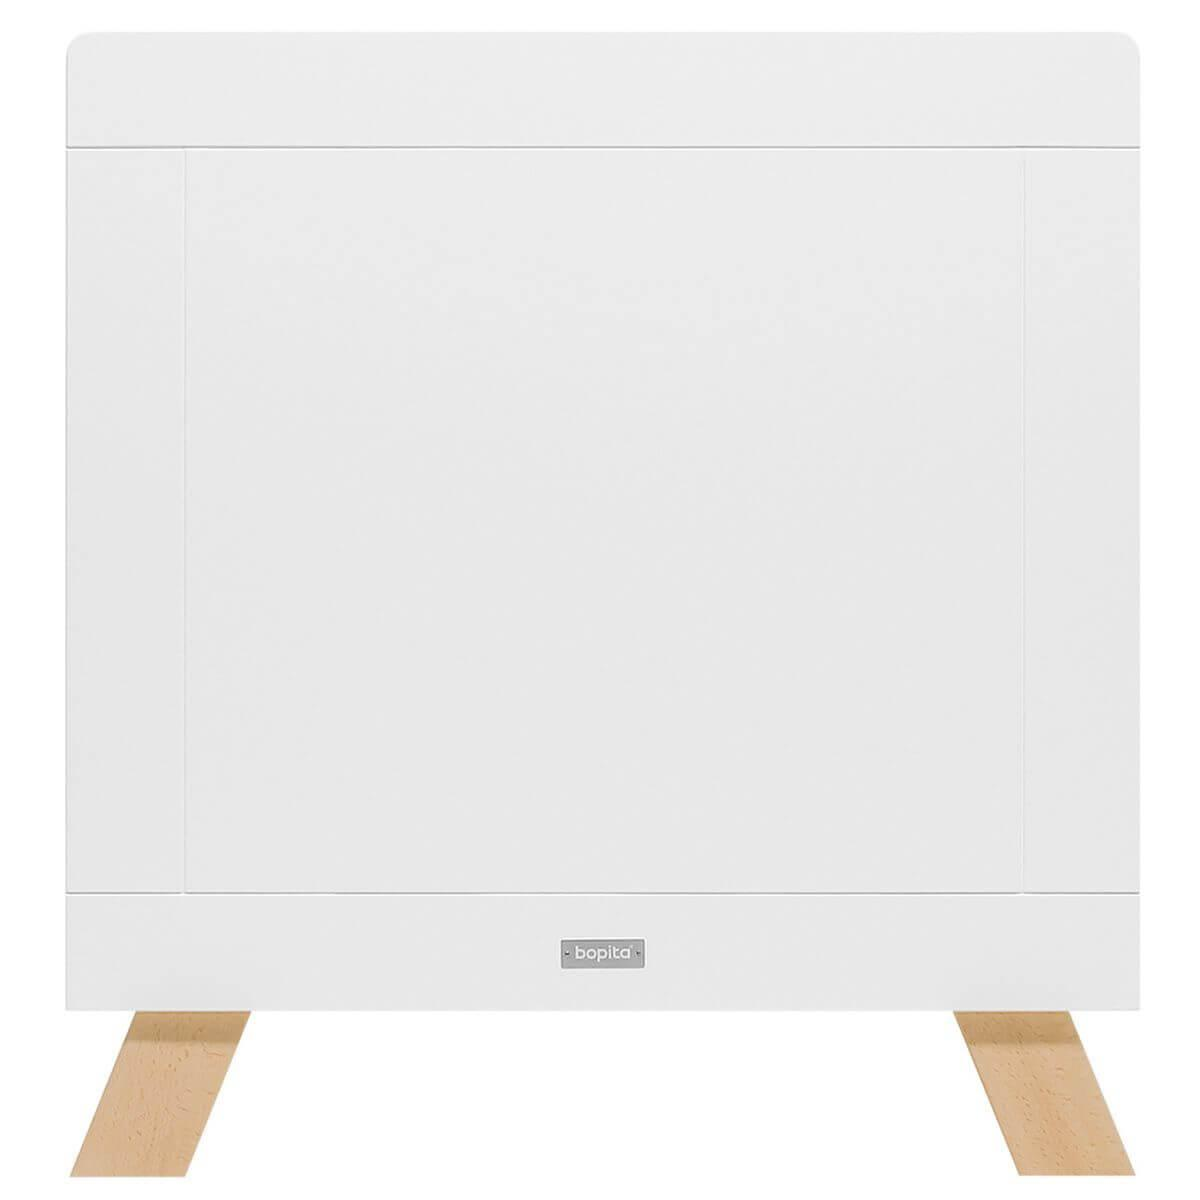 Lit banquette 70x140cm LISA Bopita blanc-naturel